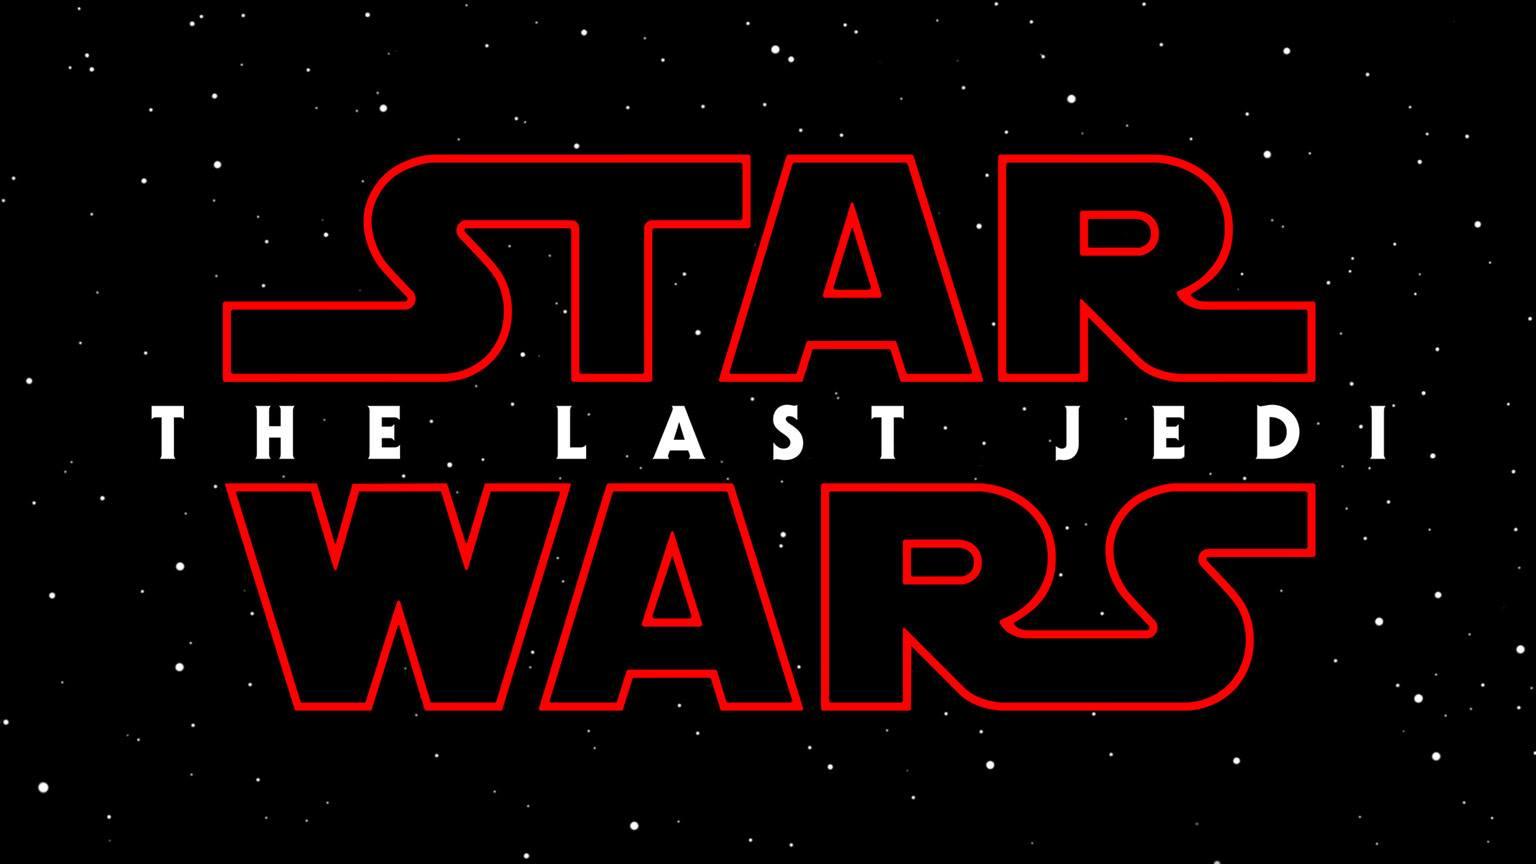 Star Wars: The Last Jedi (in original language). December  29-30